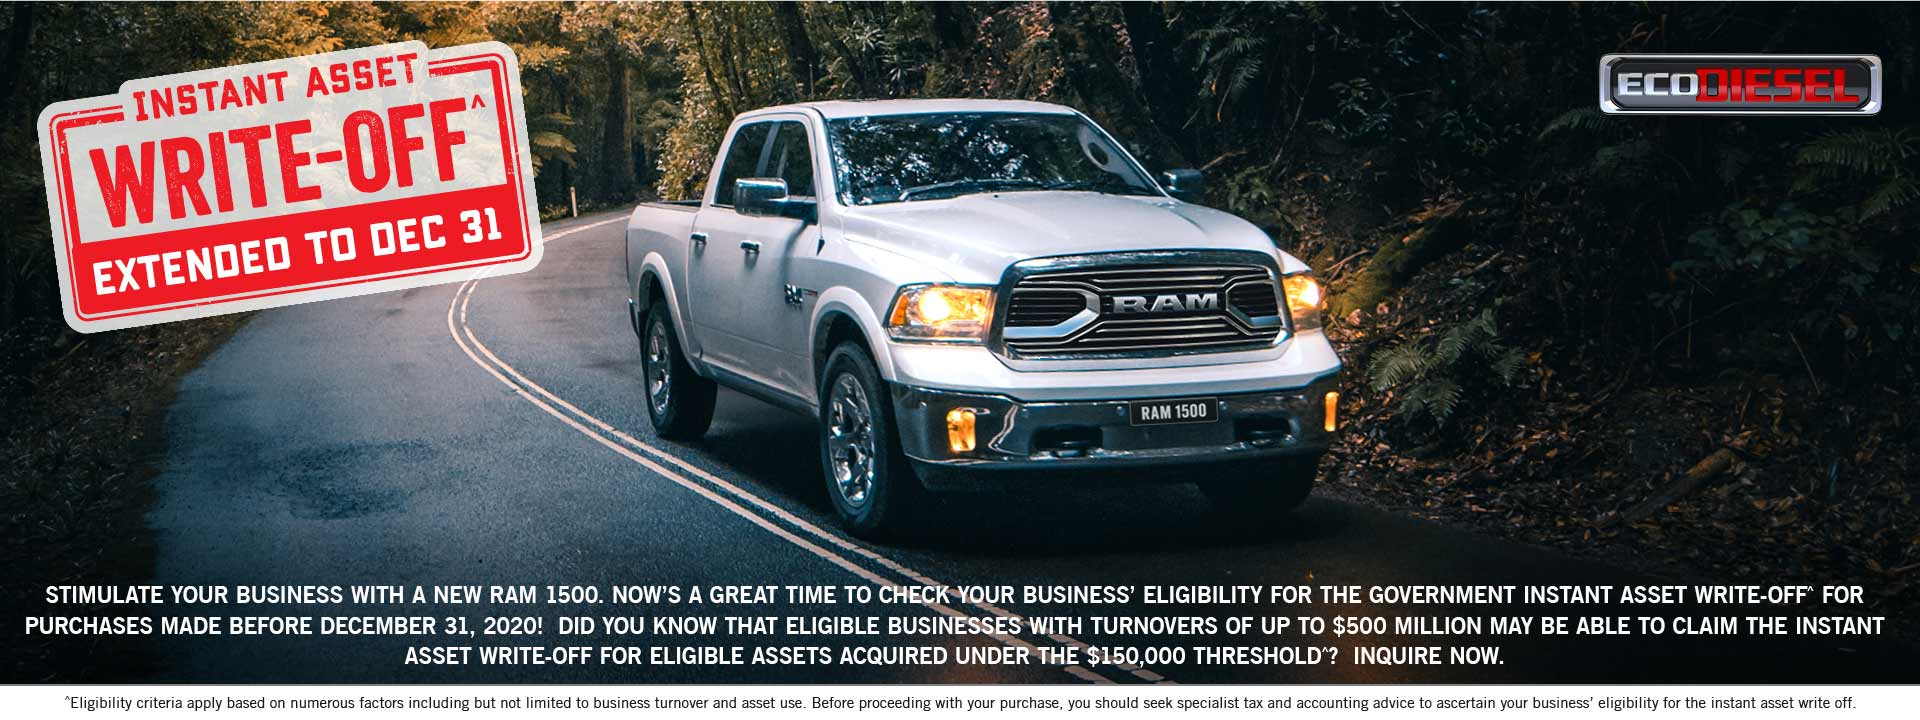 Gold Coast Ram Eco Diesel